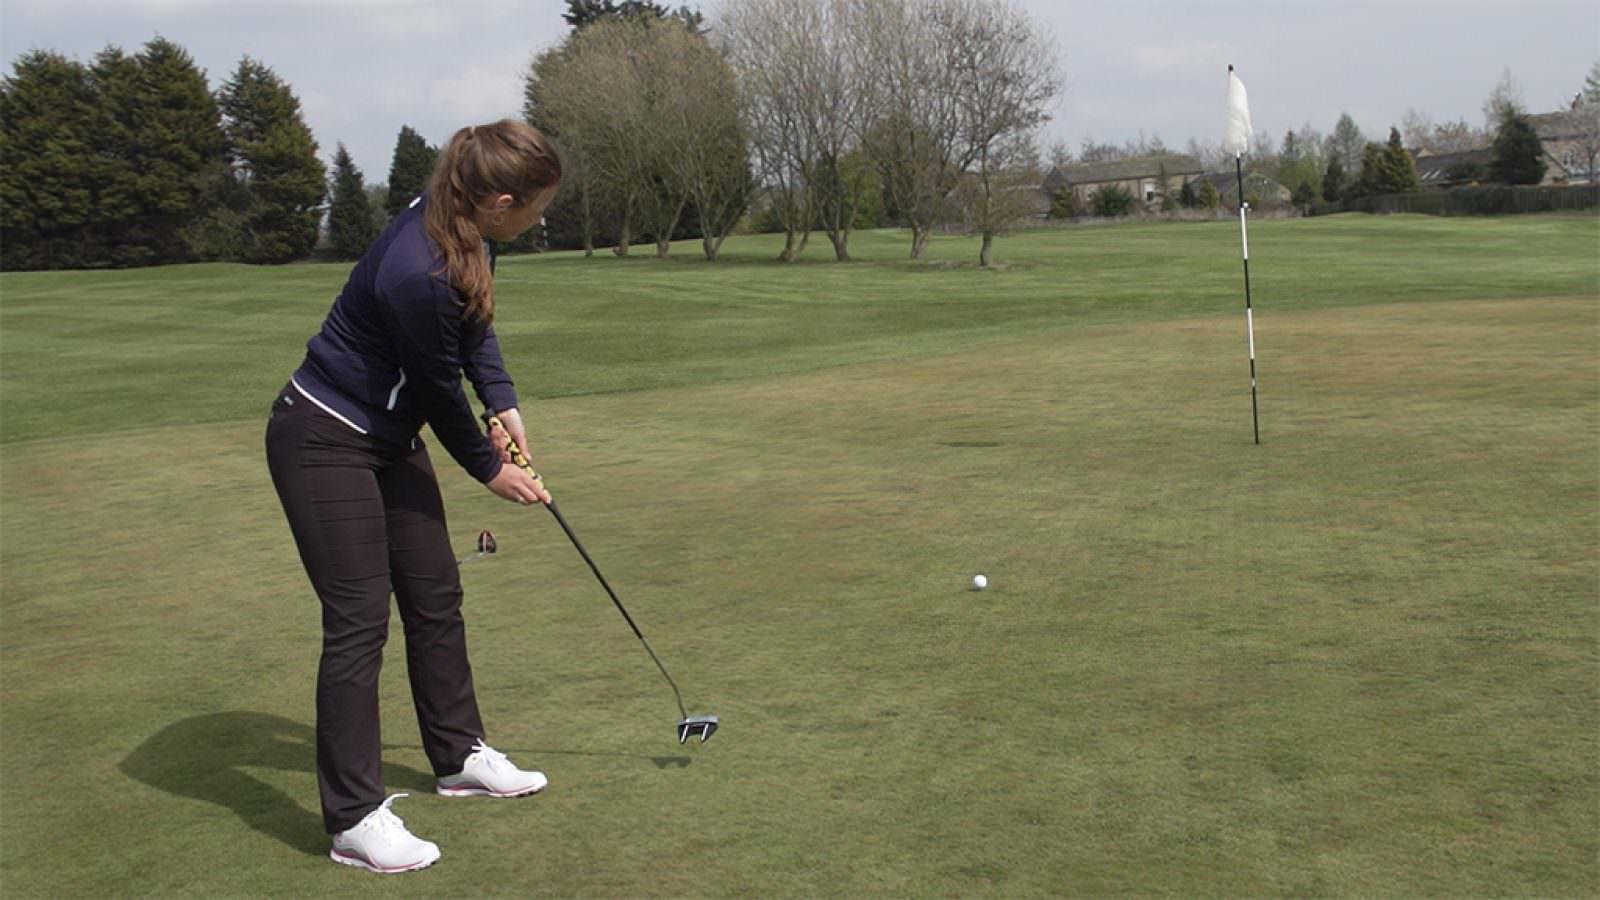 putter | National Club Golfer